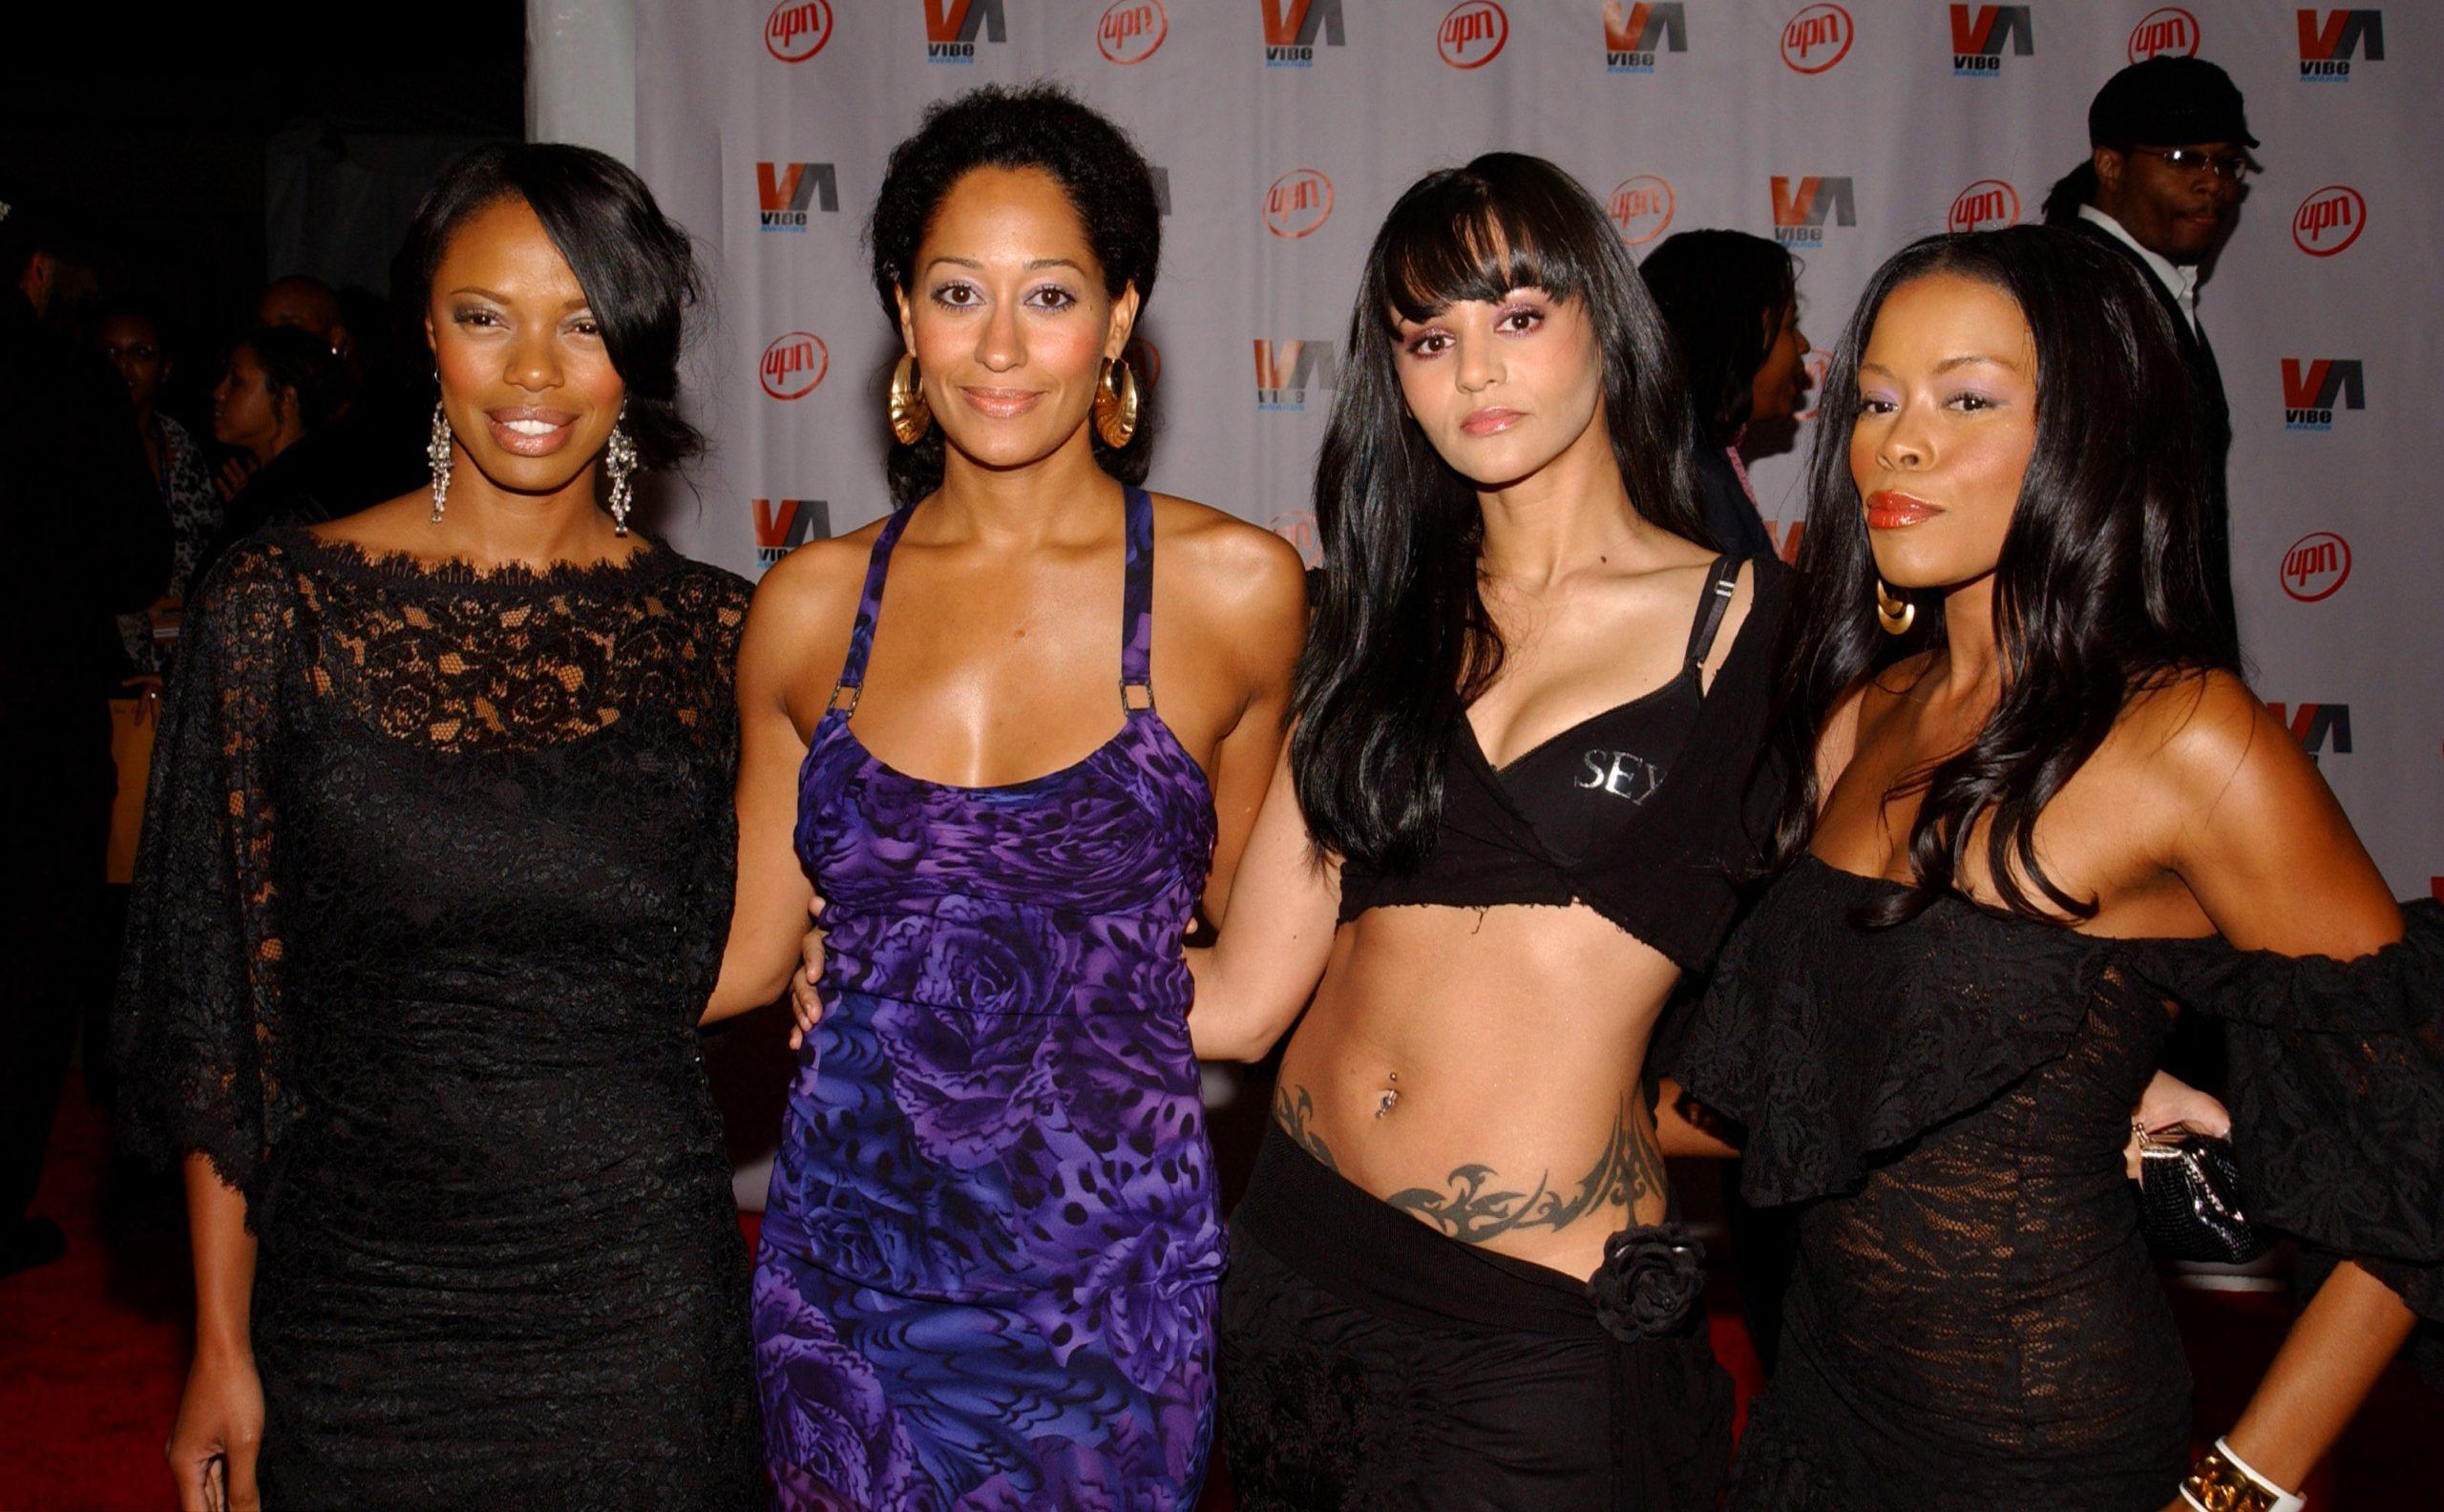 cast of girlfriends on bet